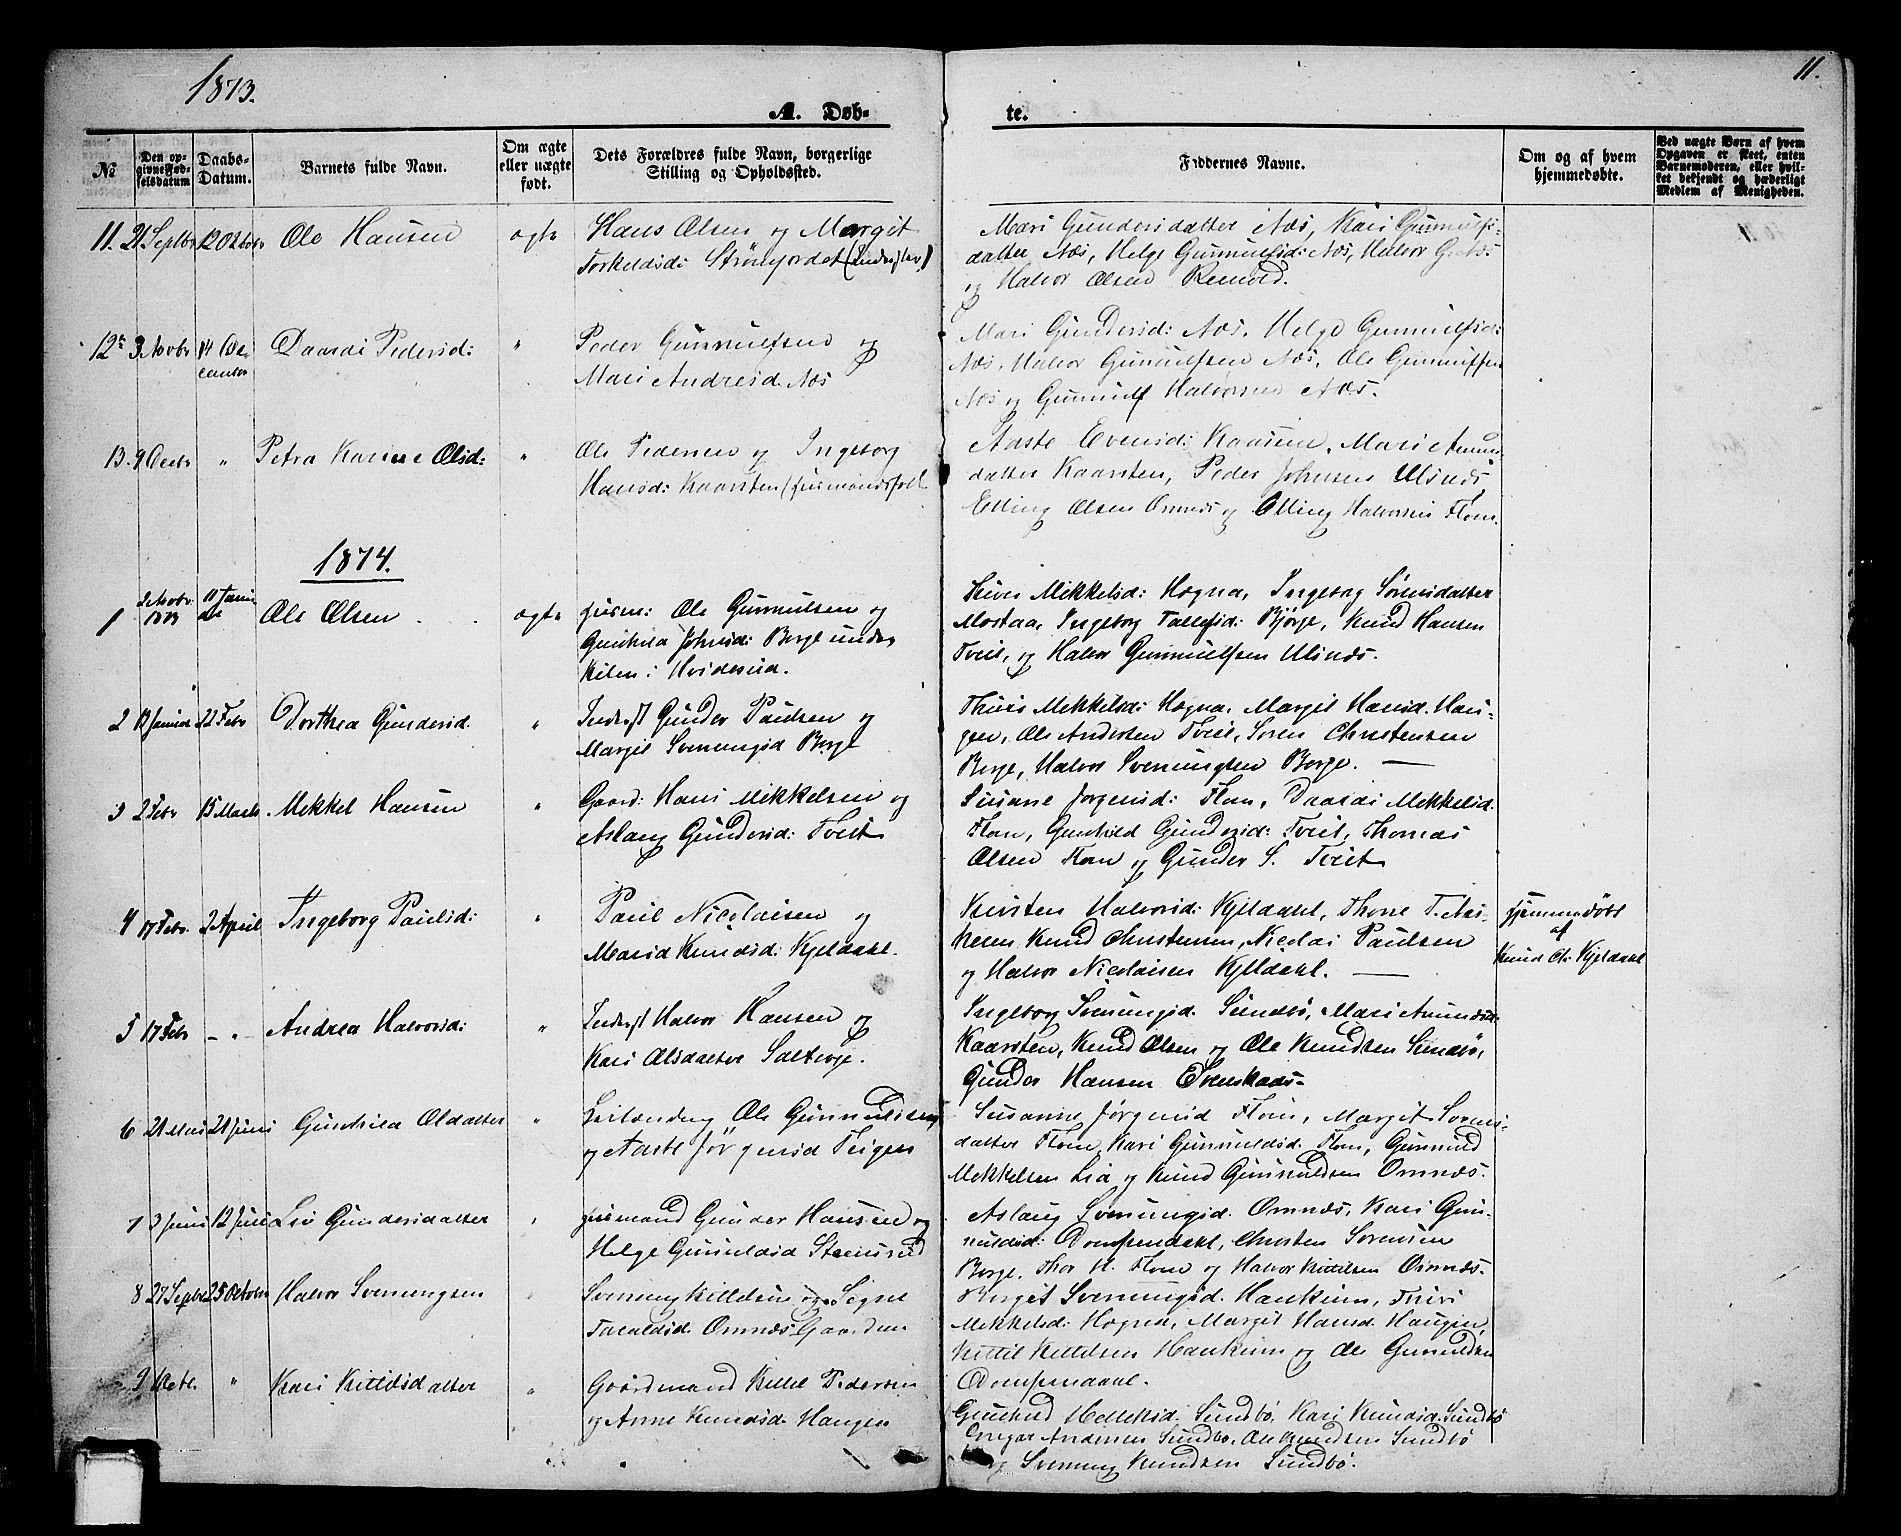 SAKO, Lunde kirkebøker, G/Gb/L0001: Klokkerbok nr. II 1, 1866-1887, s. 11